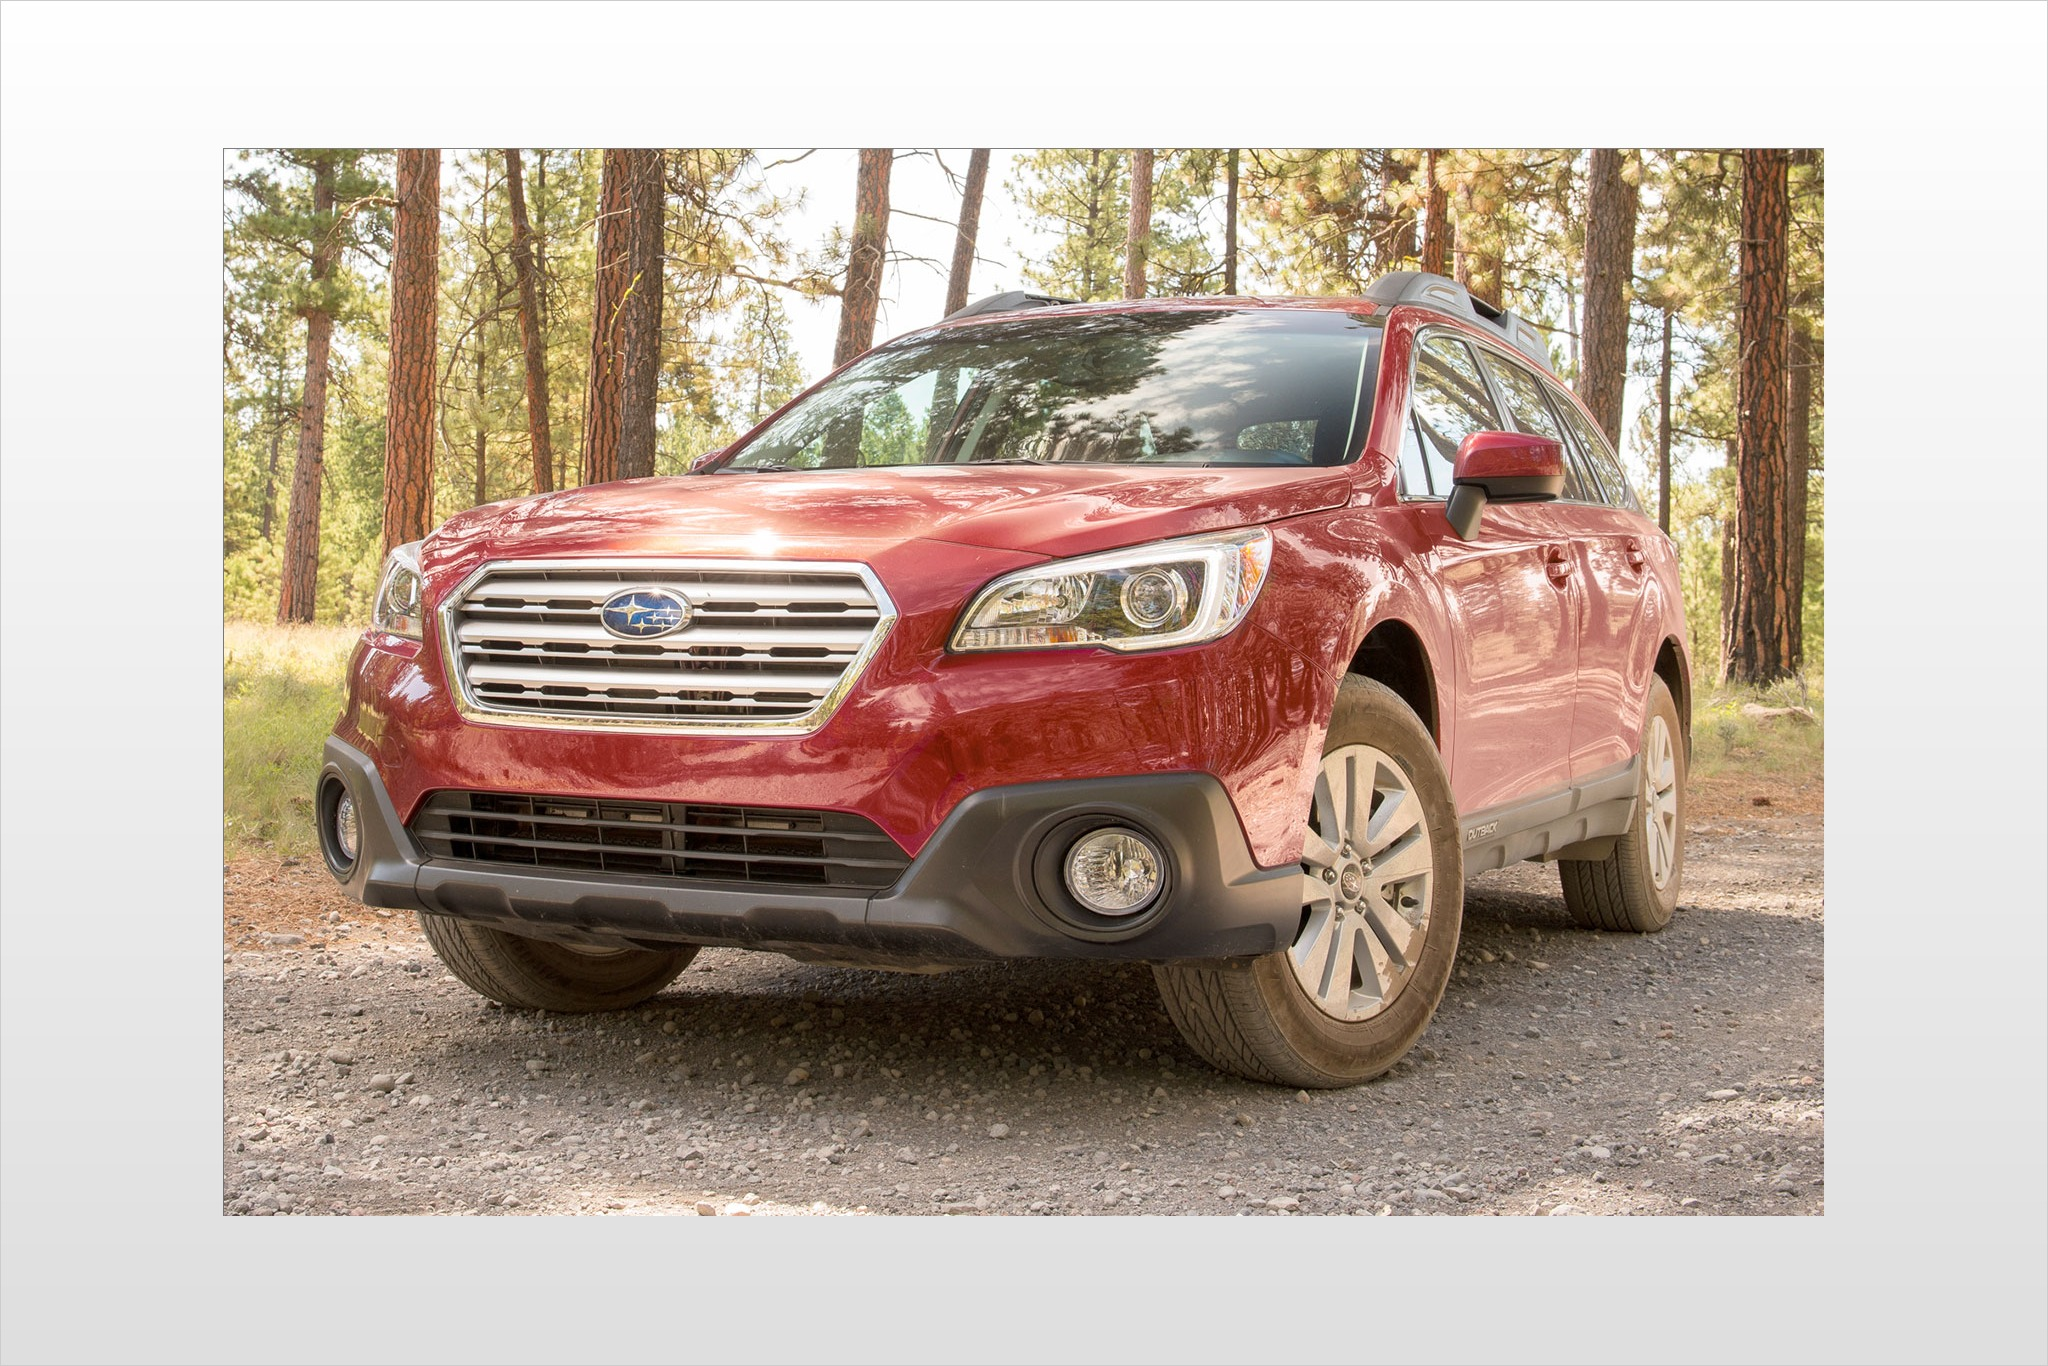 2016 subaru outback wagon 25i premium pzev fq oem 1 2048